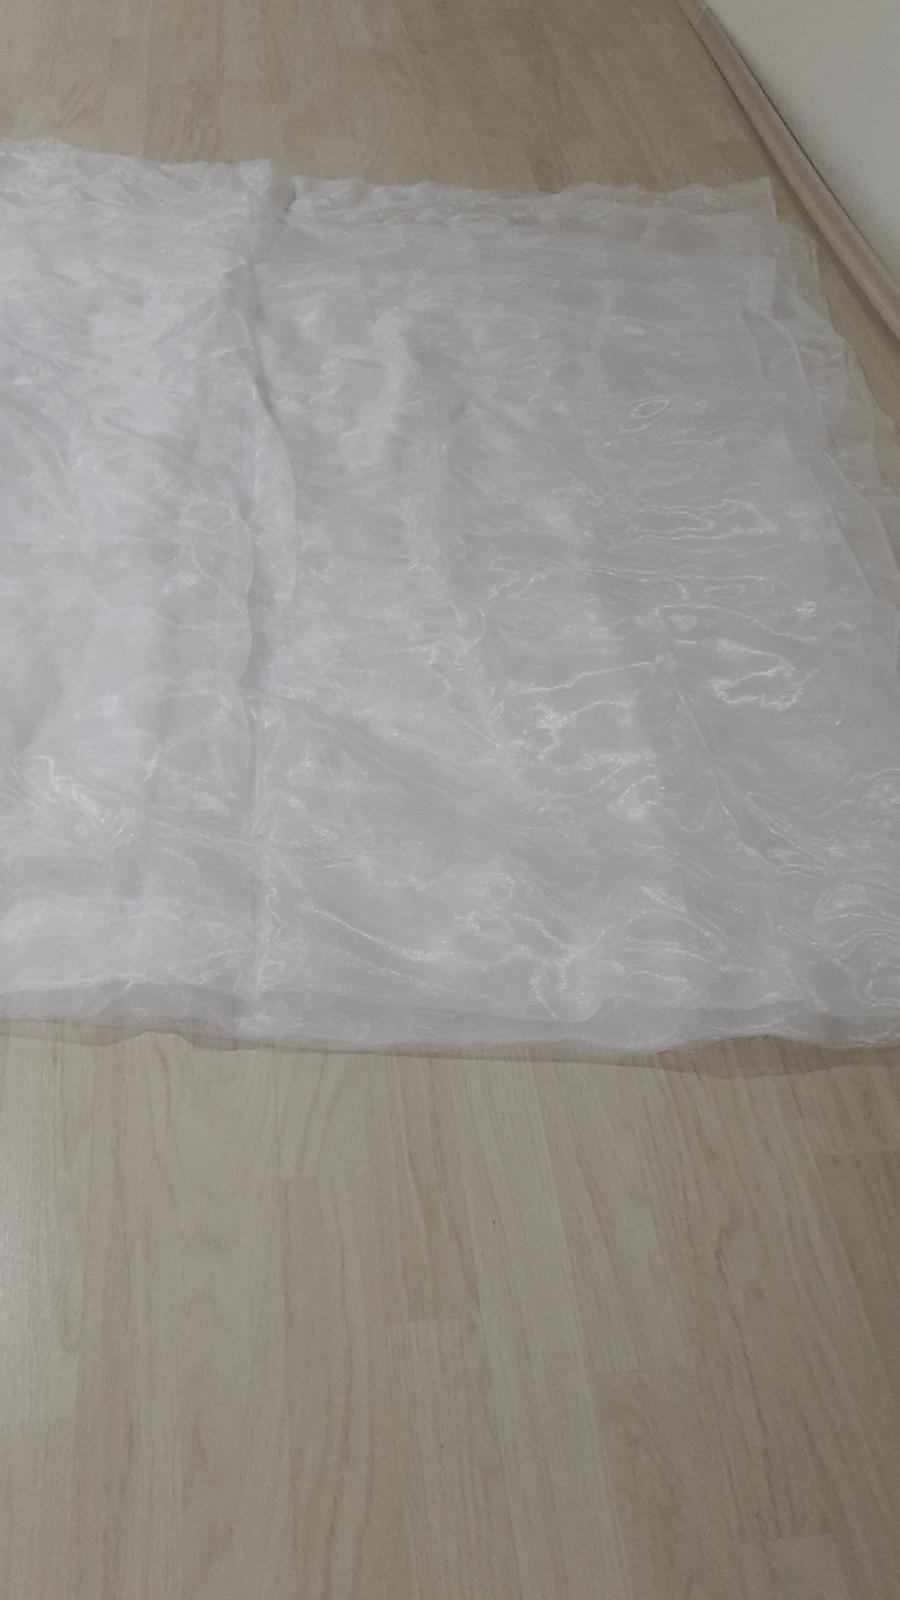 Biela organza - 10 m/140 cm - Obrázok č. 1